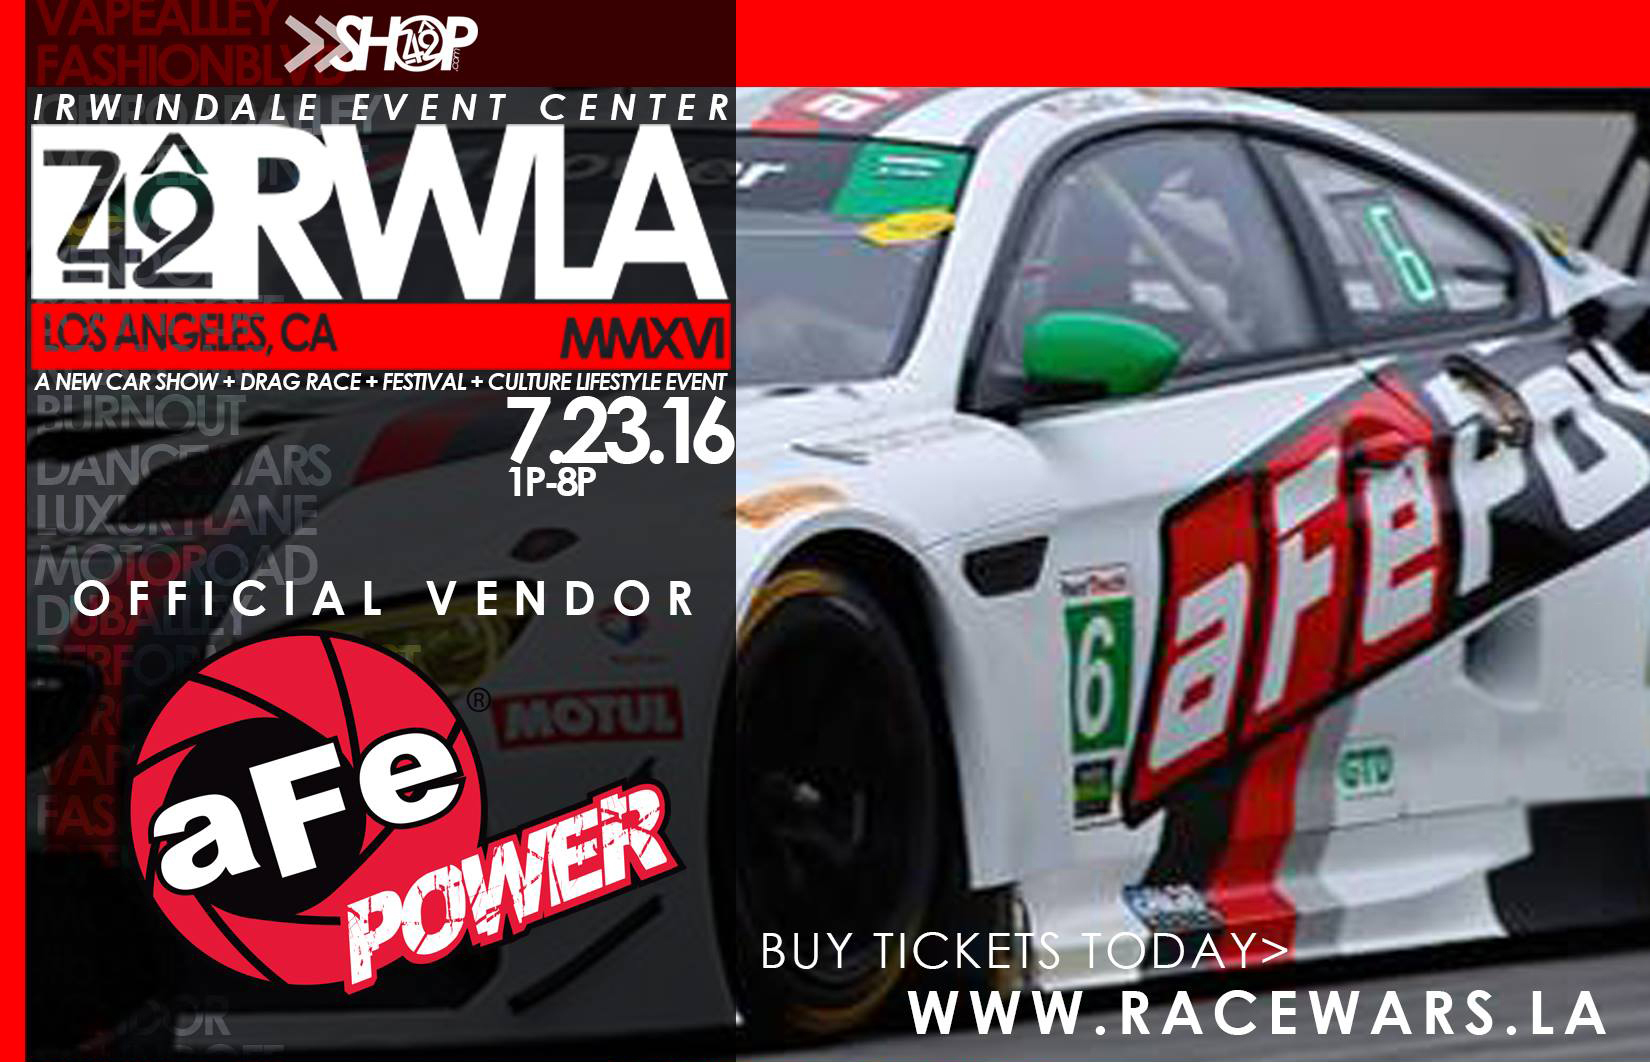 742-Racewars-aFe-POWER-Bann